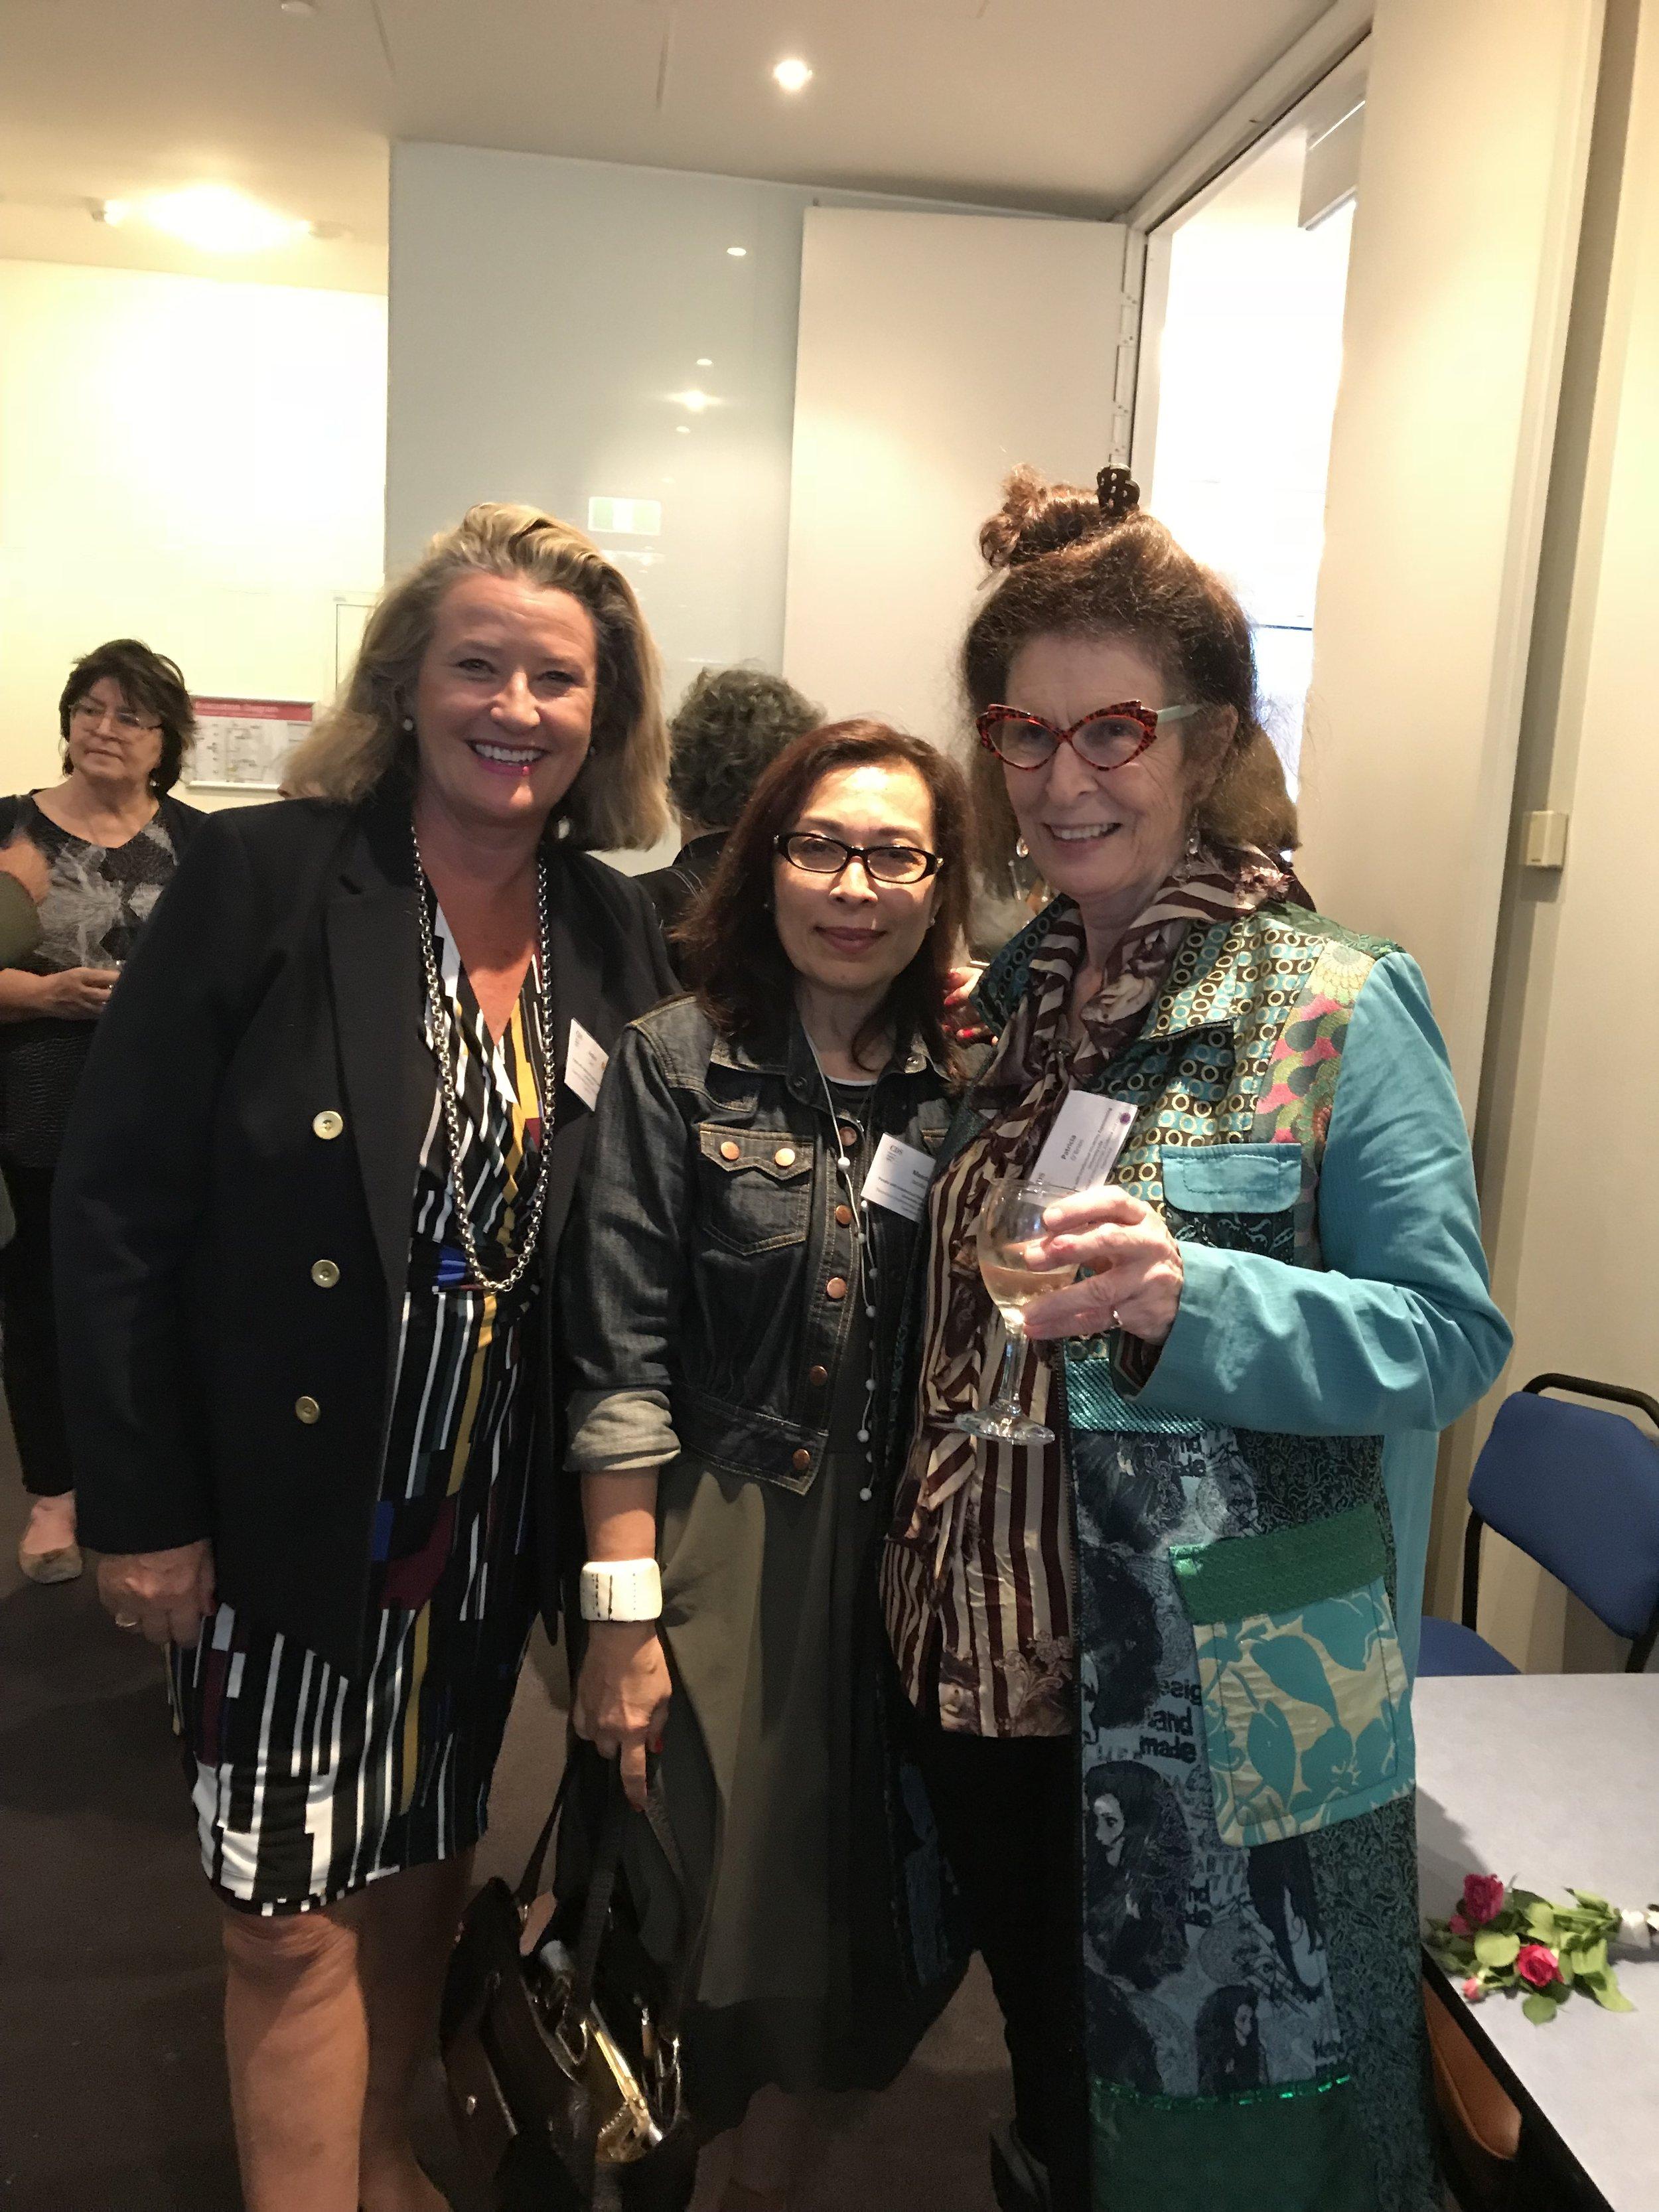 Left to right: Arahni Sont - Centro ASSIST, Meeda Jacobs - Foundation Secretary at Uni2 Beyond Foundation, Professor Patricia O'Brien - Executive Director of CDS - Professor of Disability Studies